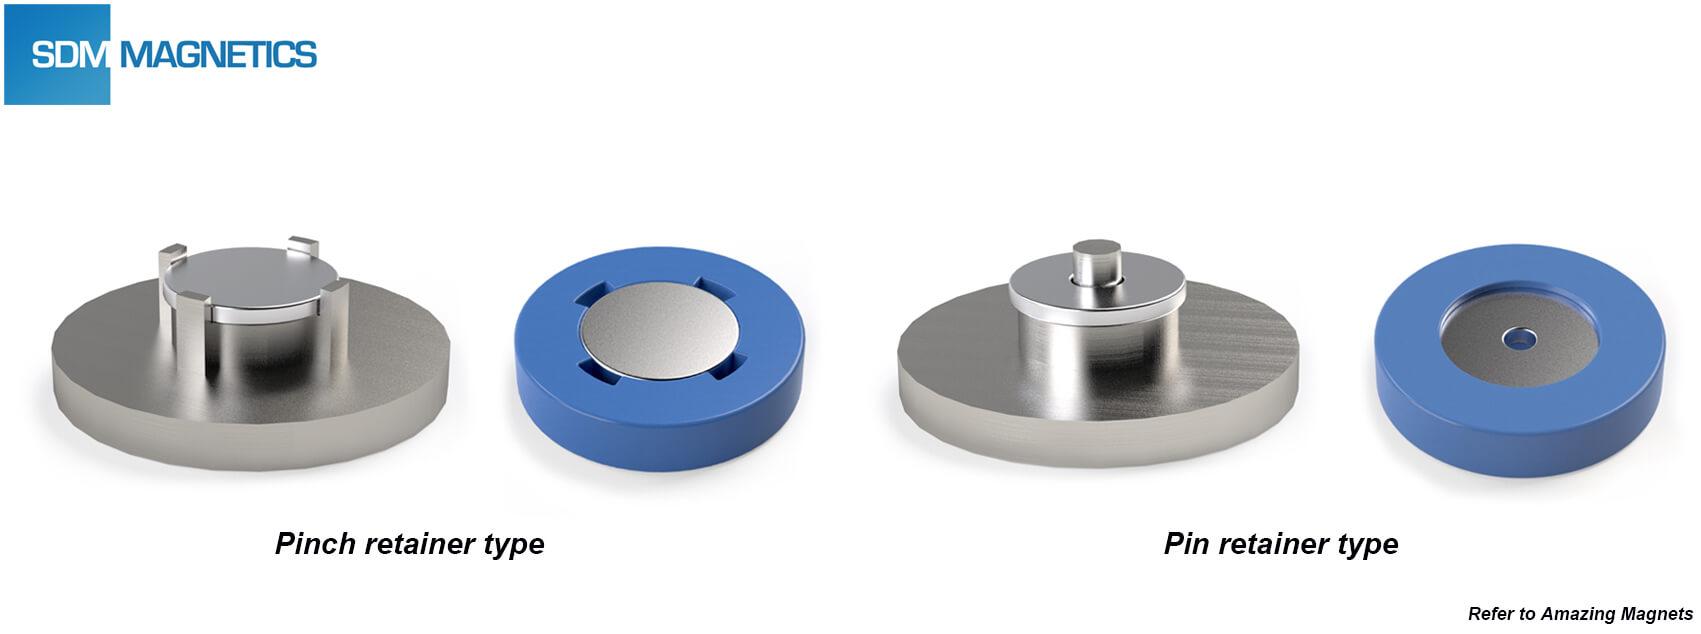 Cimkiz Ultra Thin Magnetic Webcam Cover Review